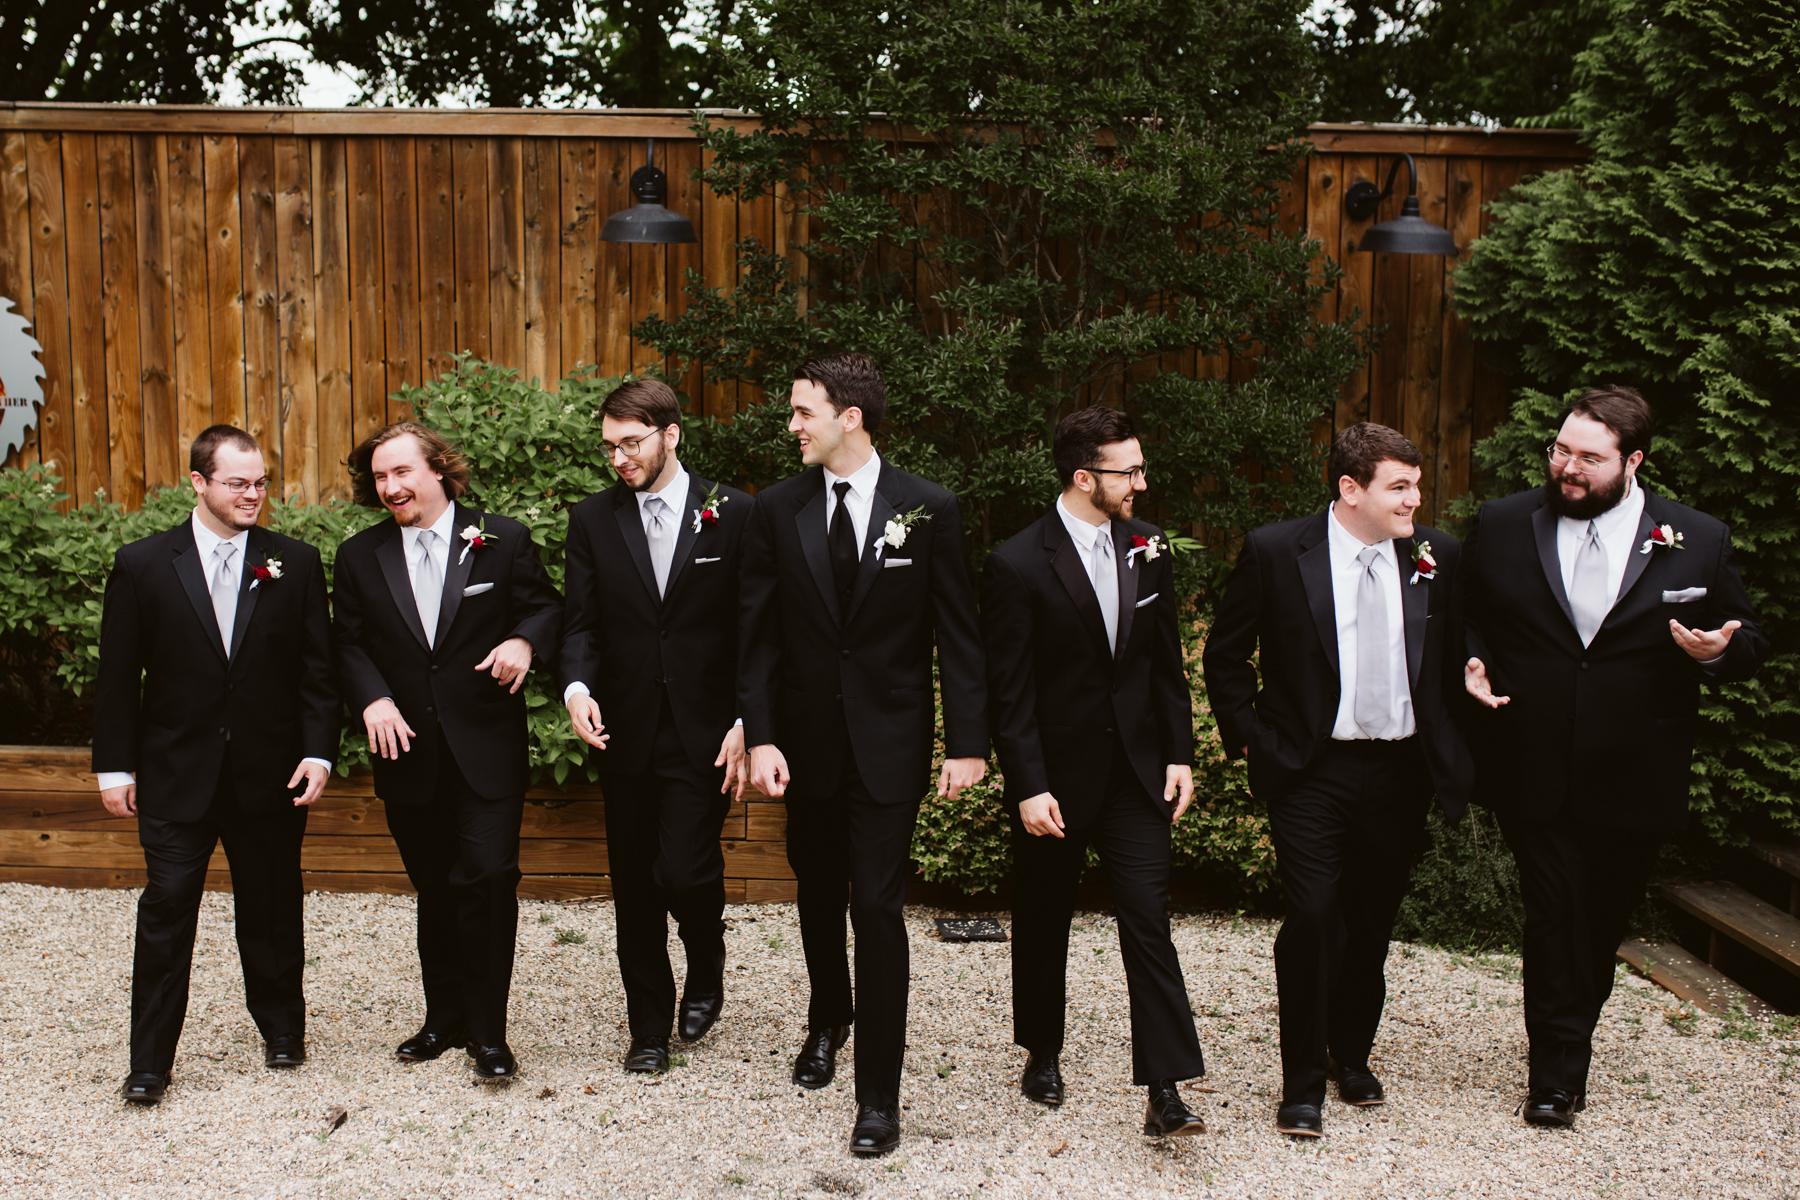 brentwood-hills-wedding (5).jpg